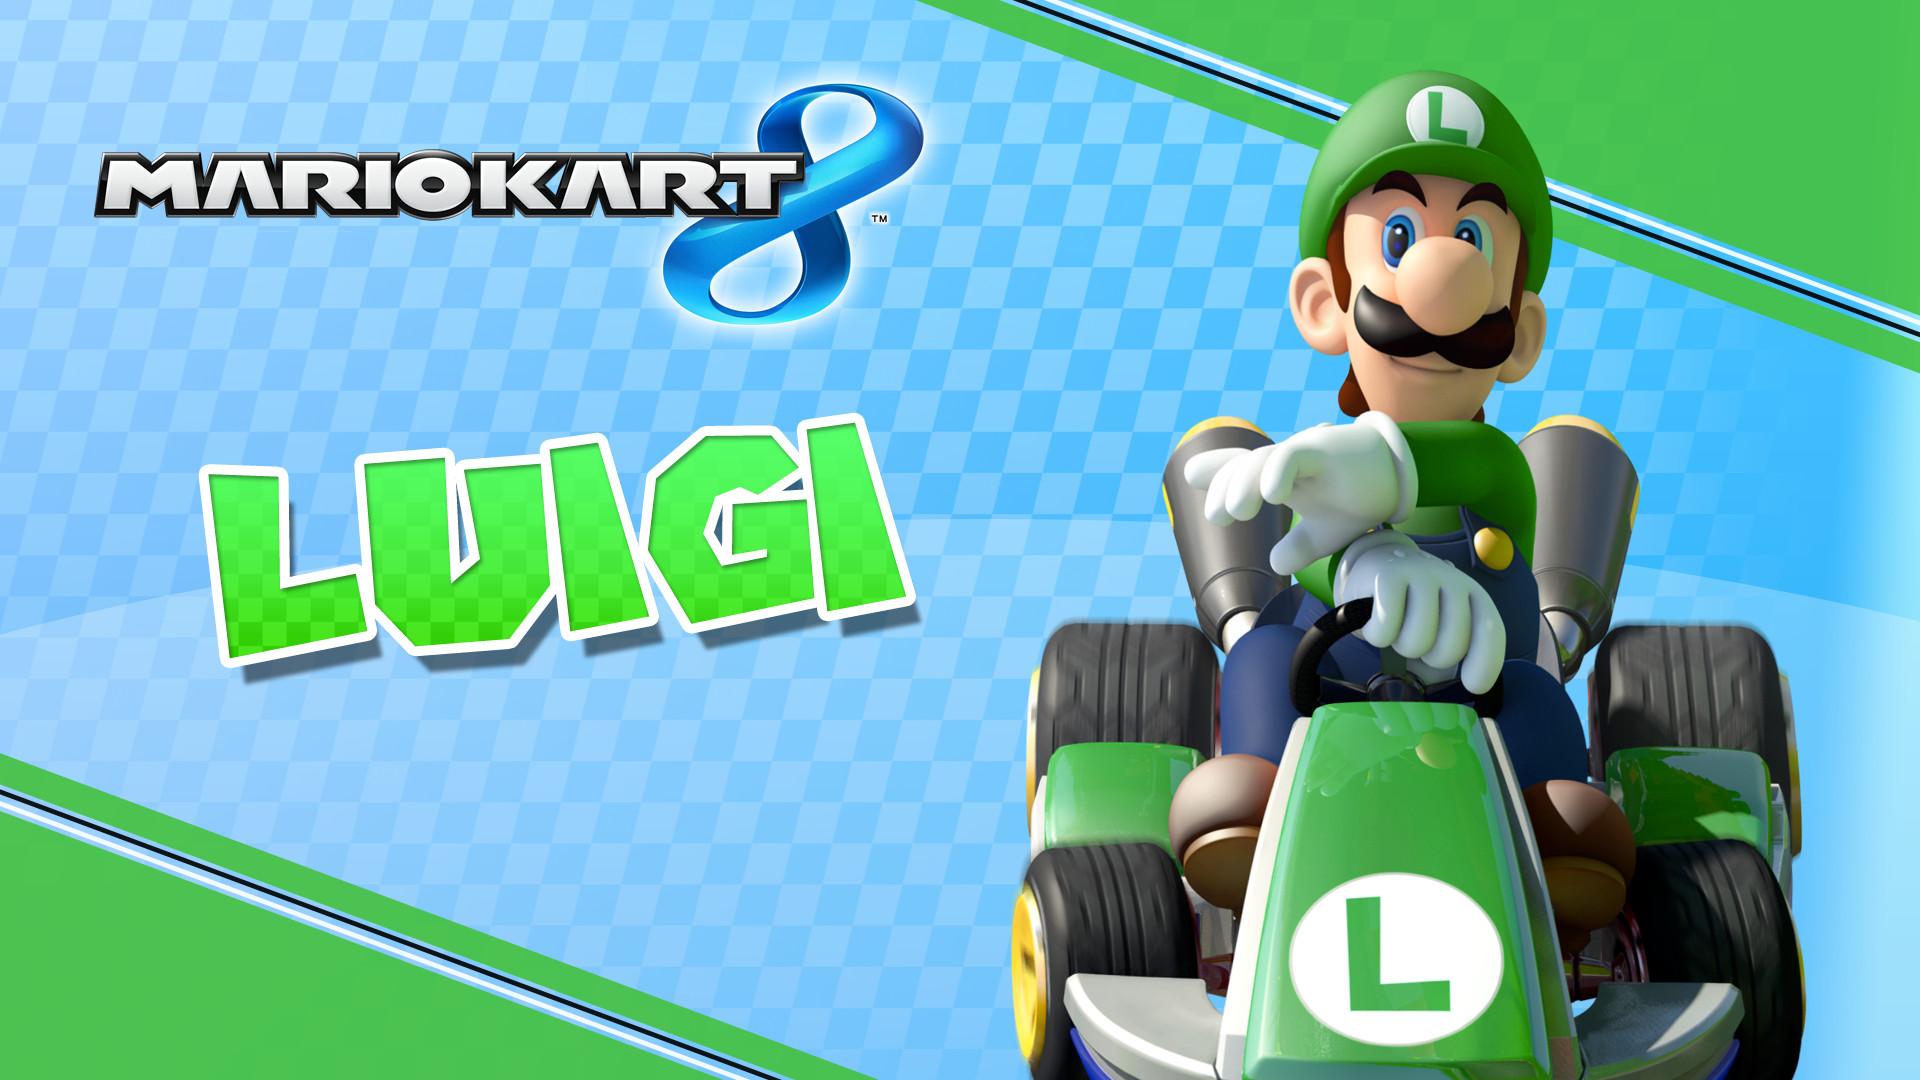 Mario Kart 8 Wallpaper Hd 72 Images Wii Luigi Circuit 1920x1080 529176